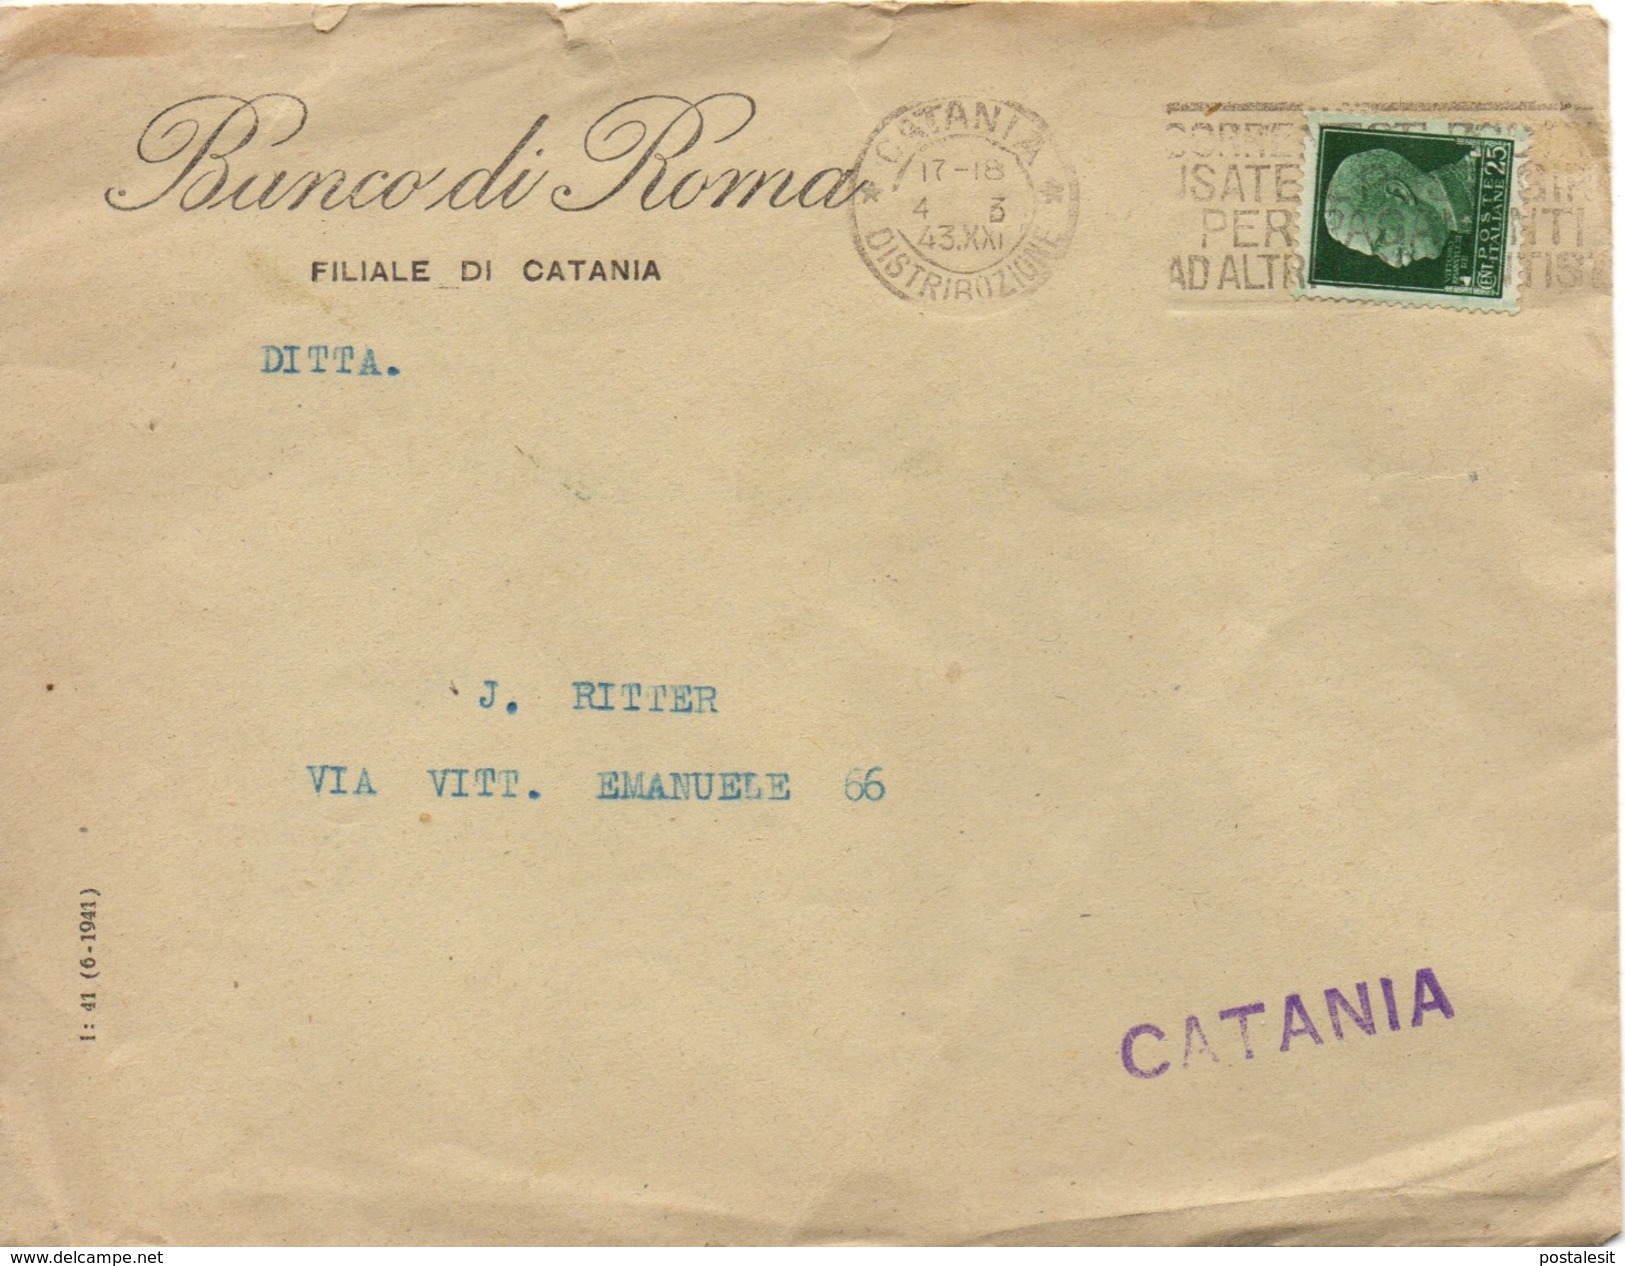 CATANIA (TARGHETTA) Per CITTA' - 4.3.1943 - Busta INTESTATA Tariffa DISTRETTO 25c. Imperiale 2/104 - 1900-44 Vittorio Emanuele III